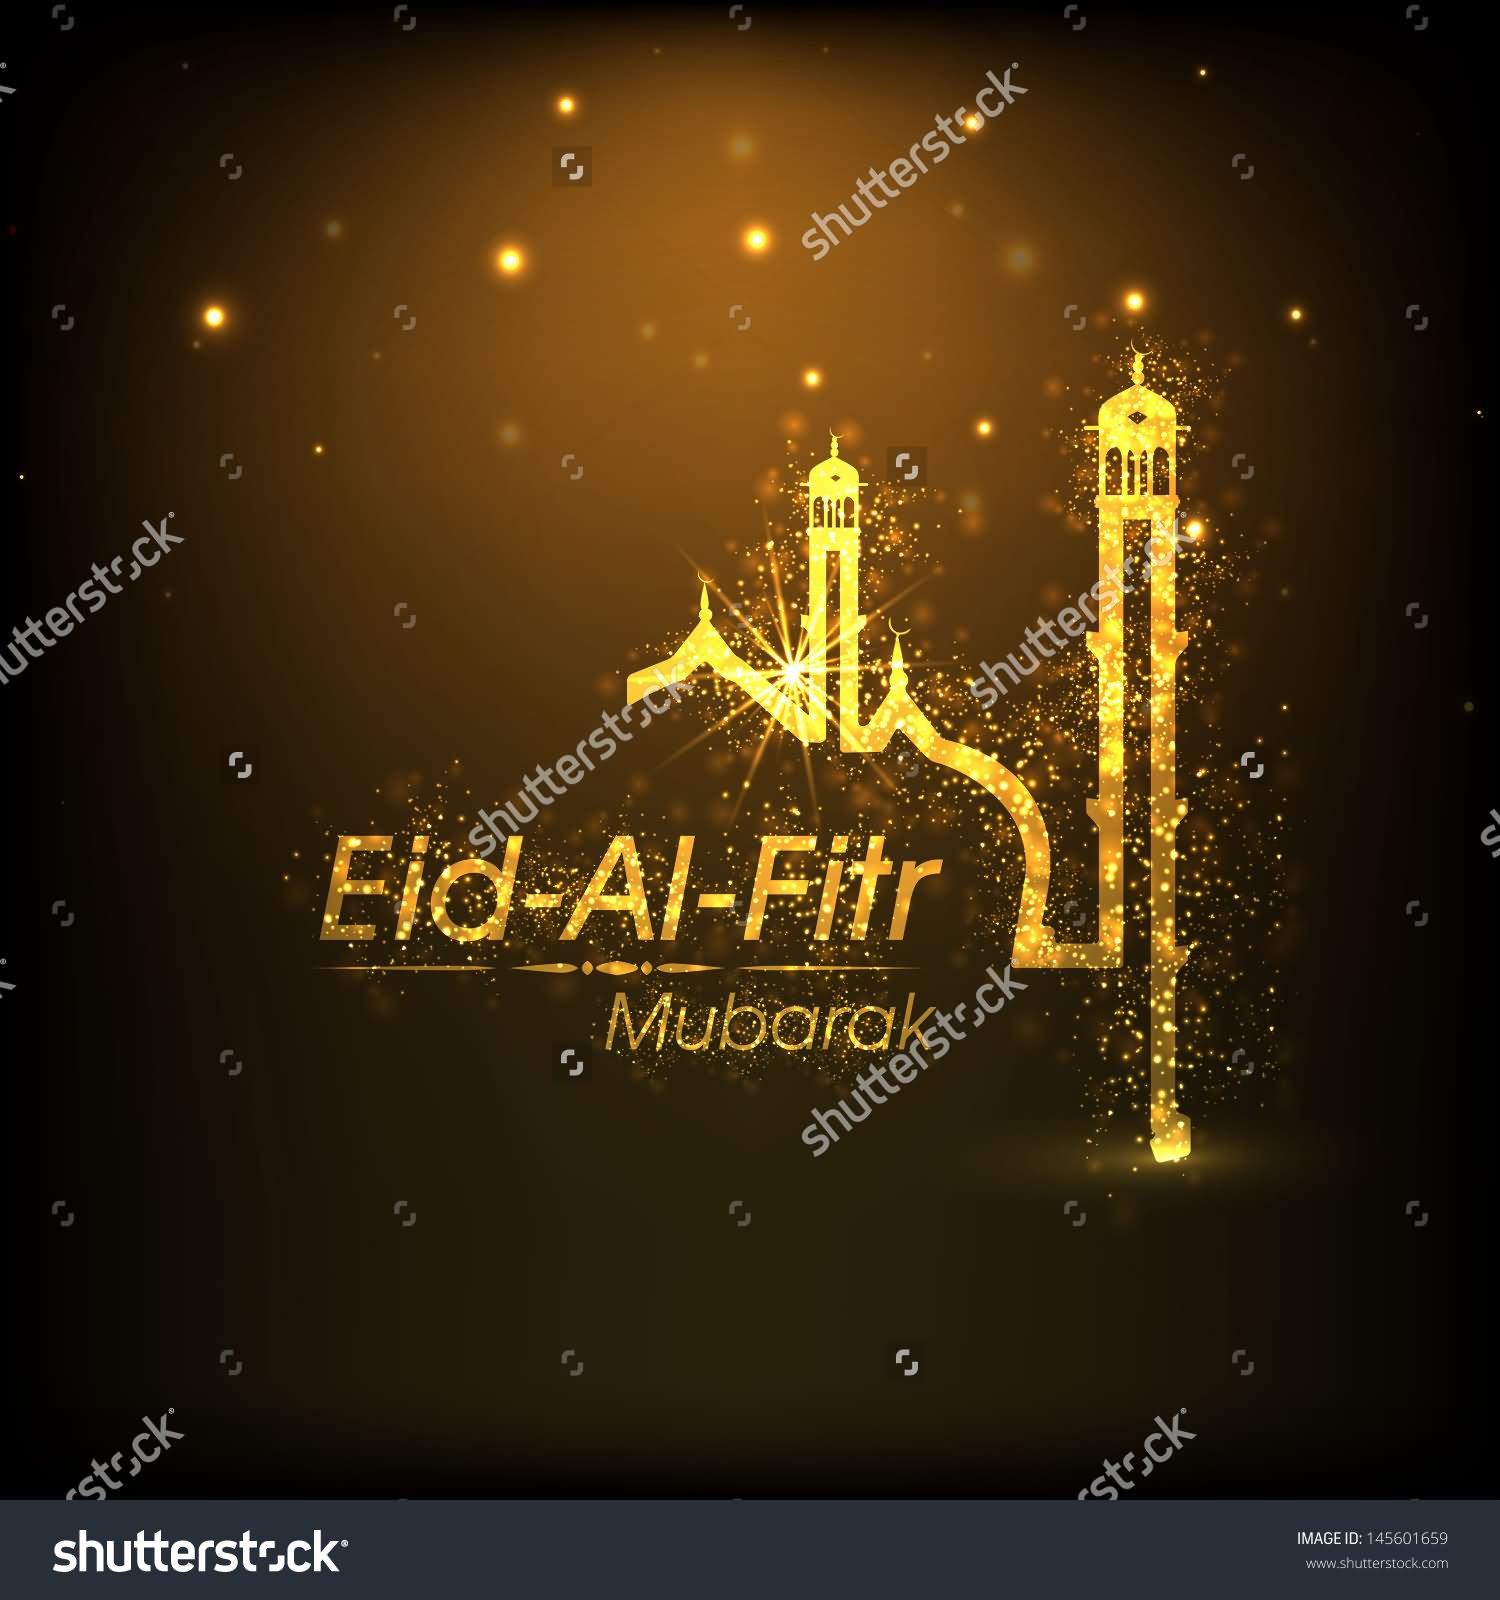 Eid Ul Fitr Mubarak 2016 Greetings Picture Newsrescue